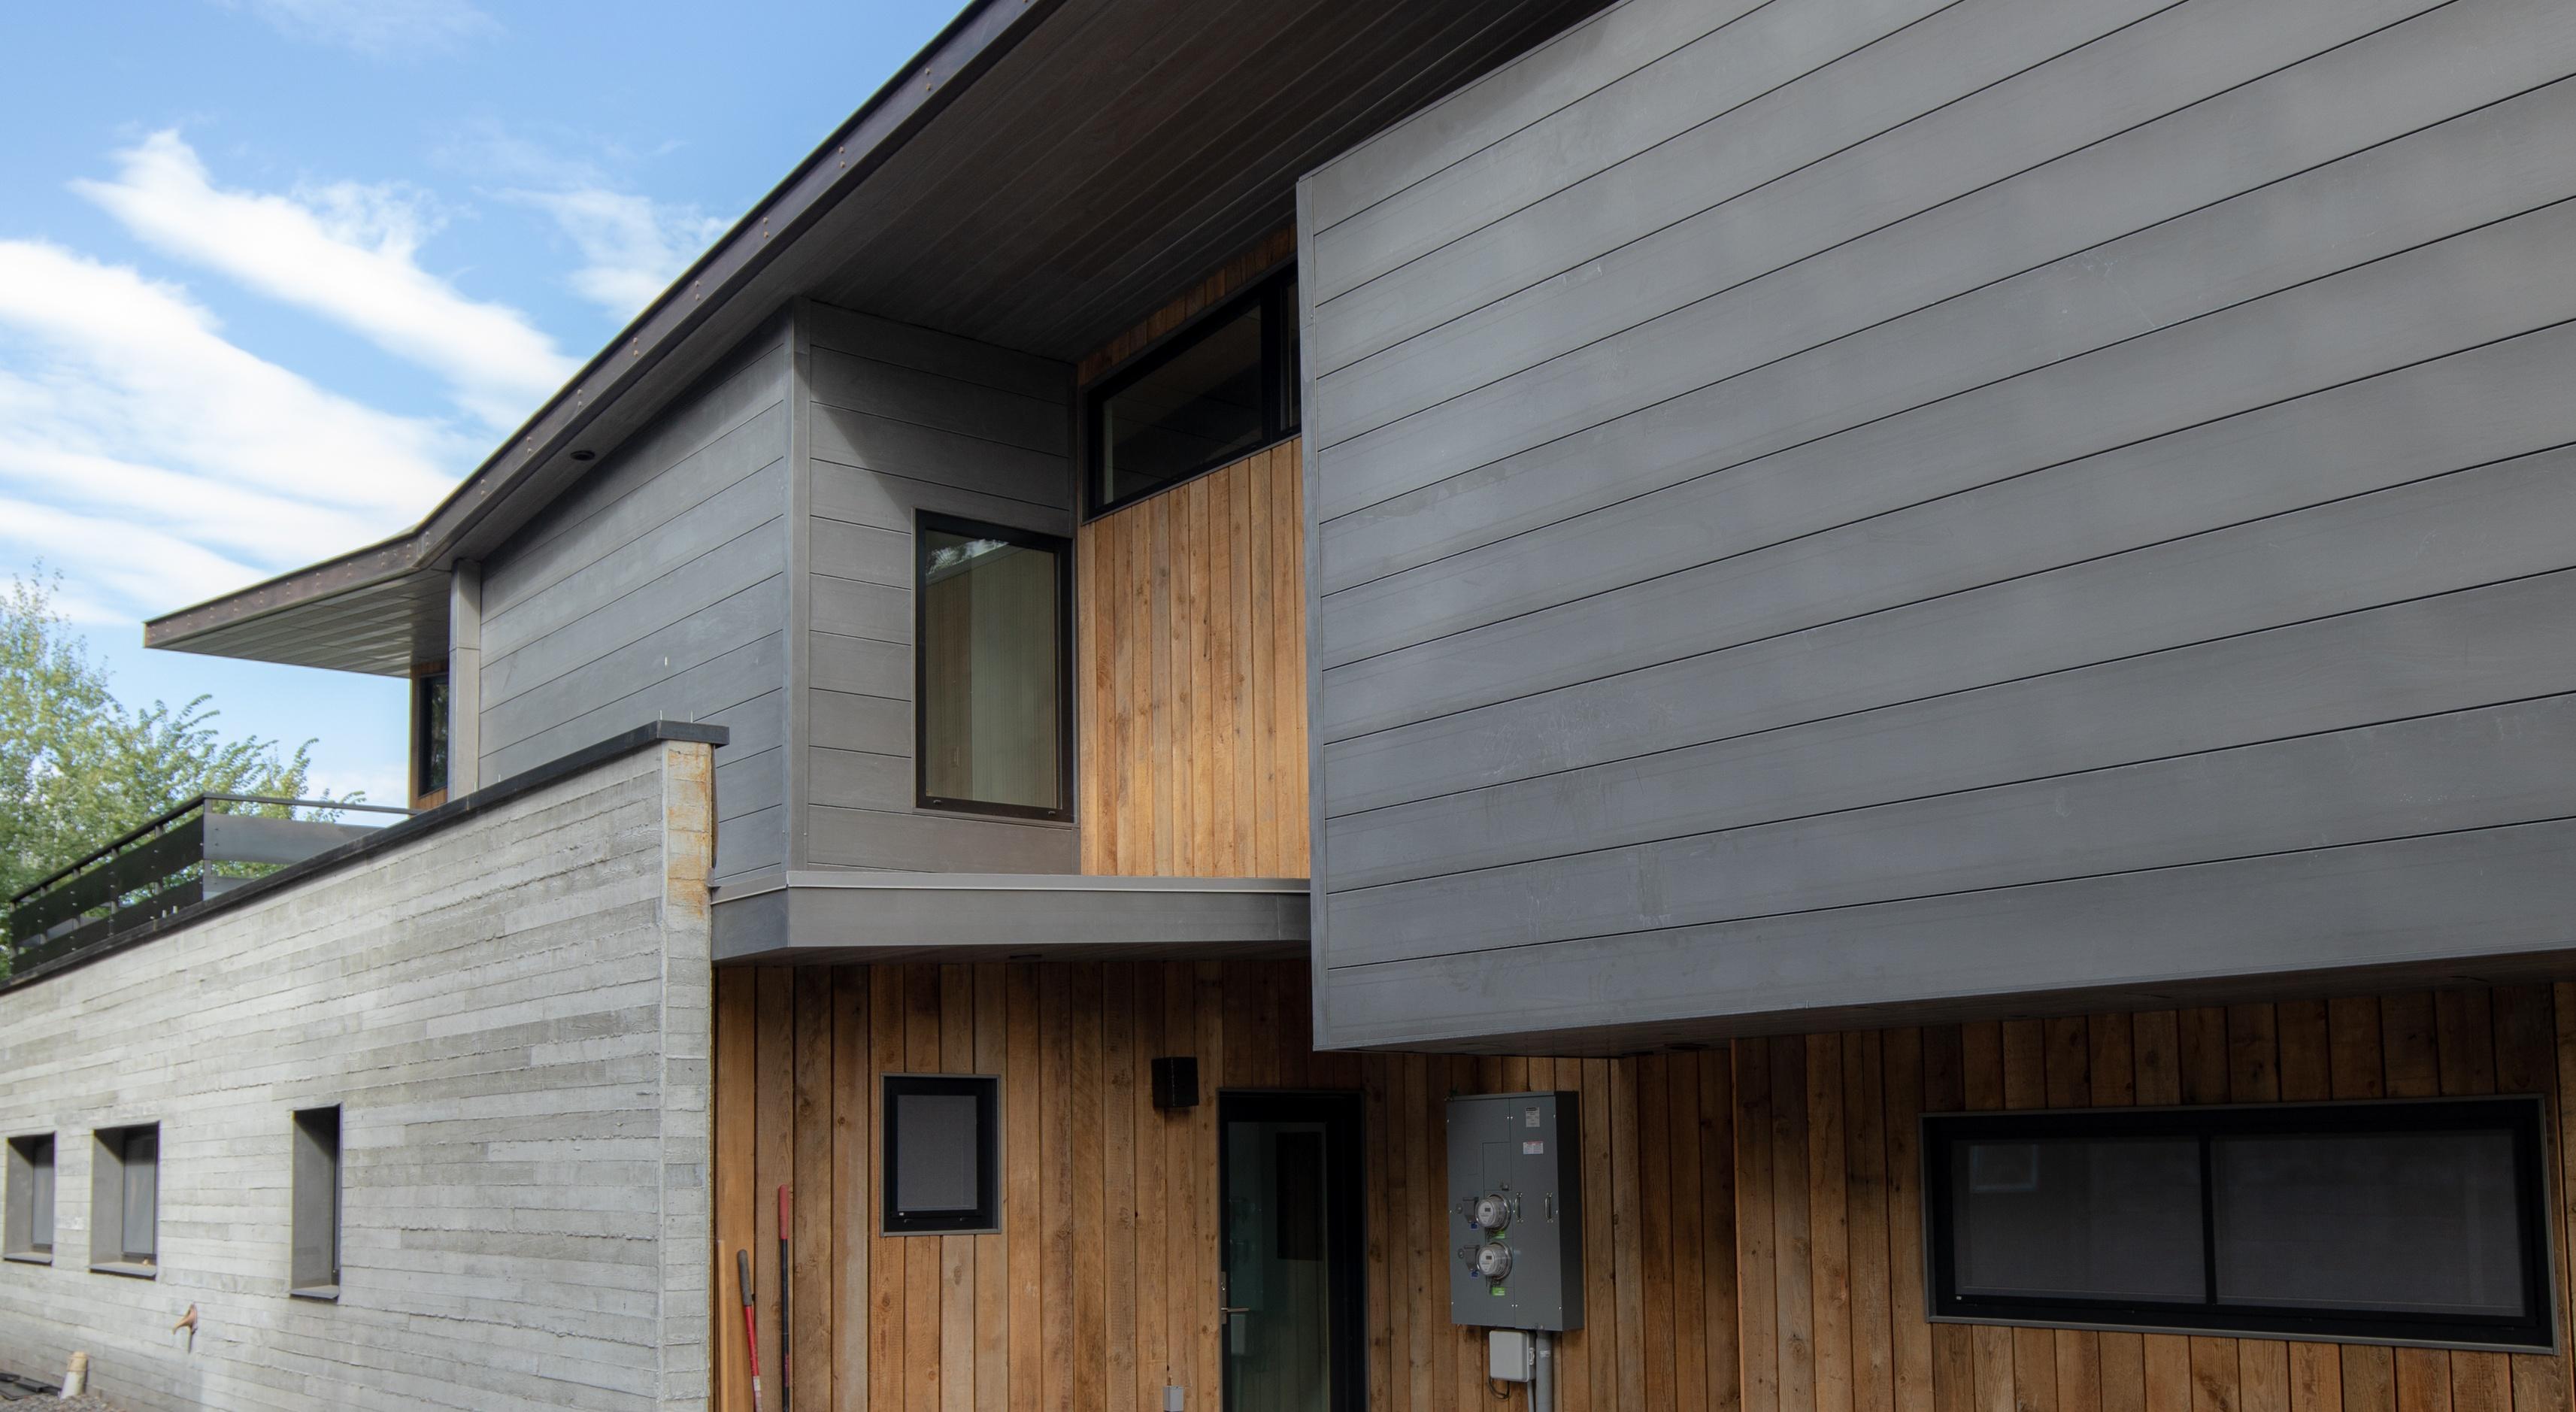 bonderized metal siding on modern home